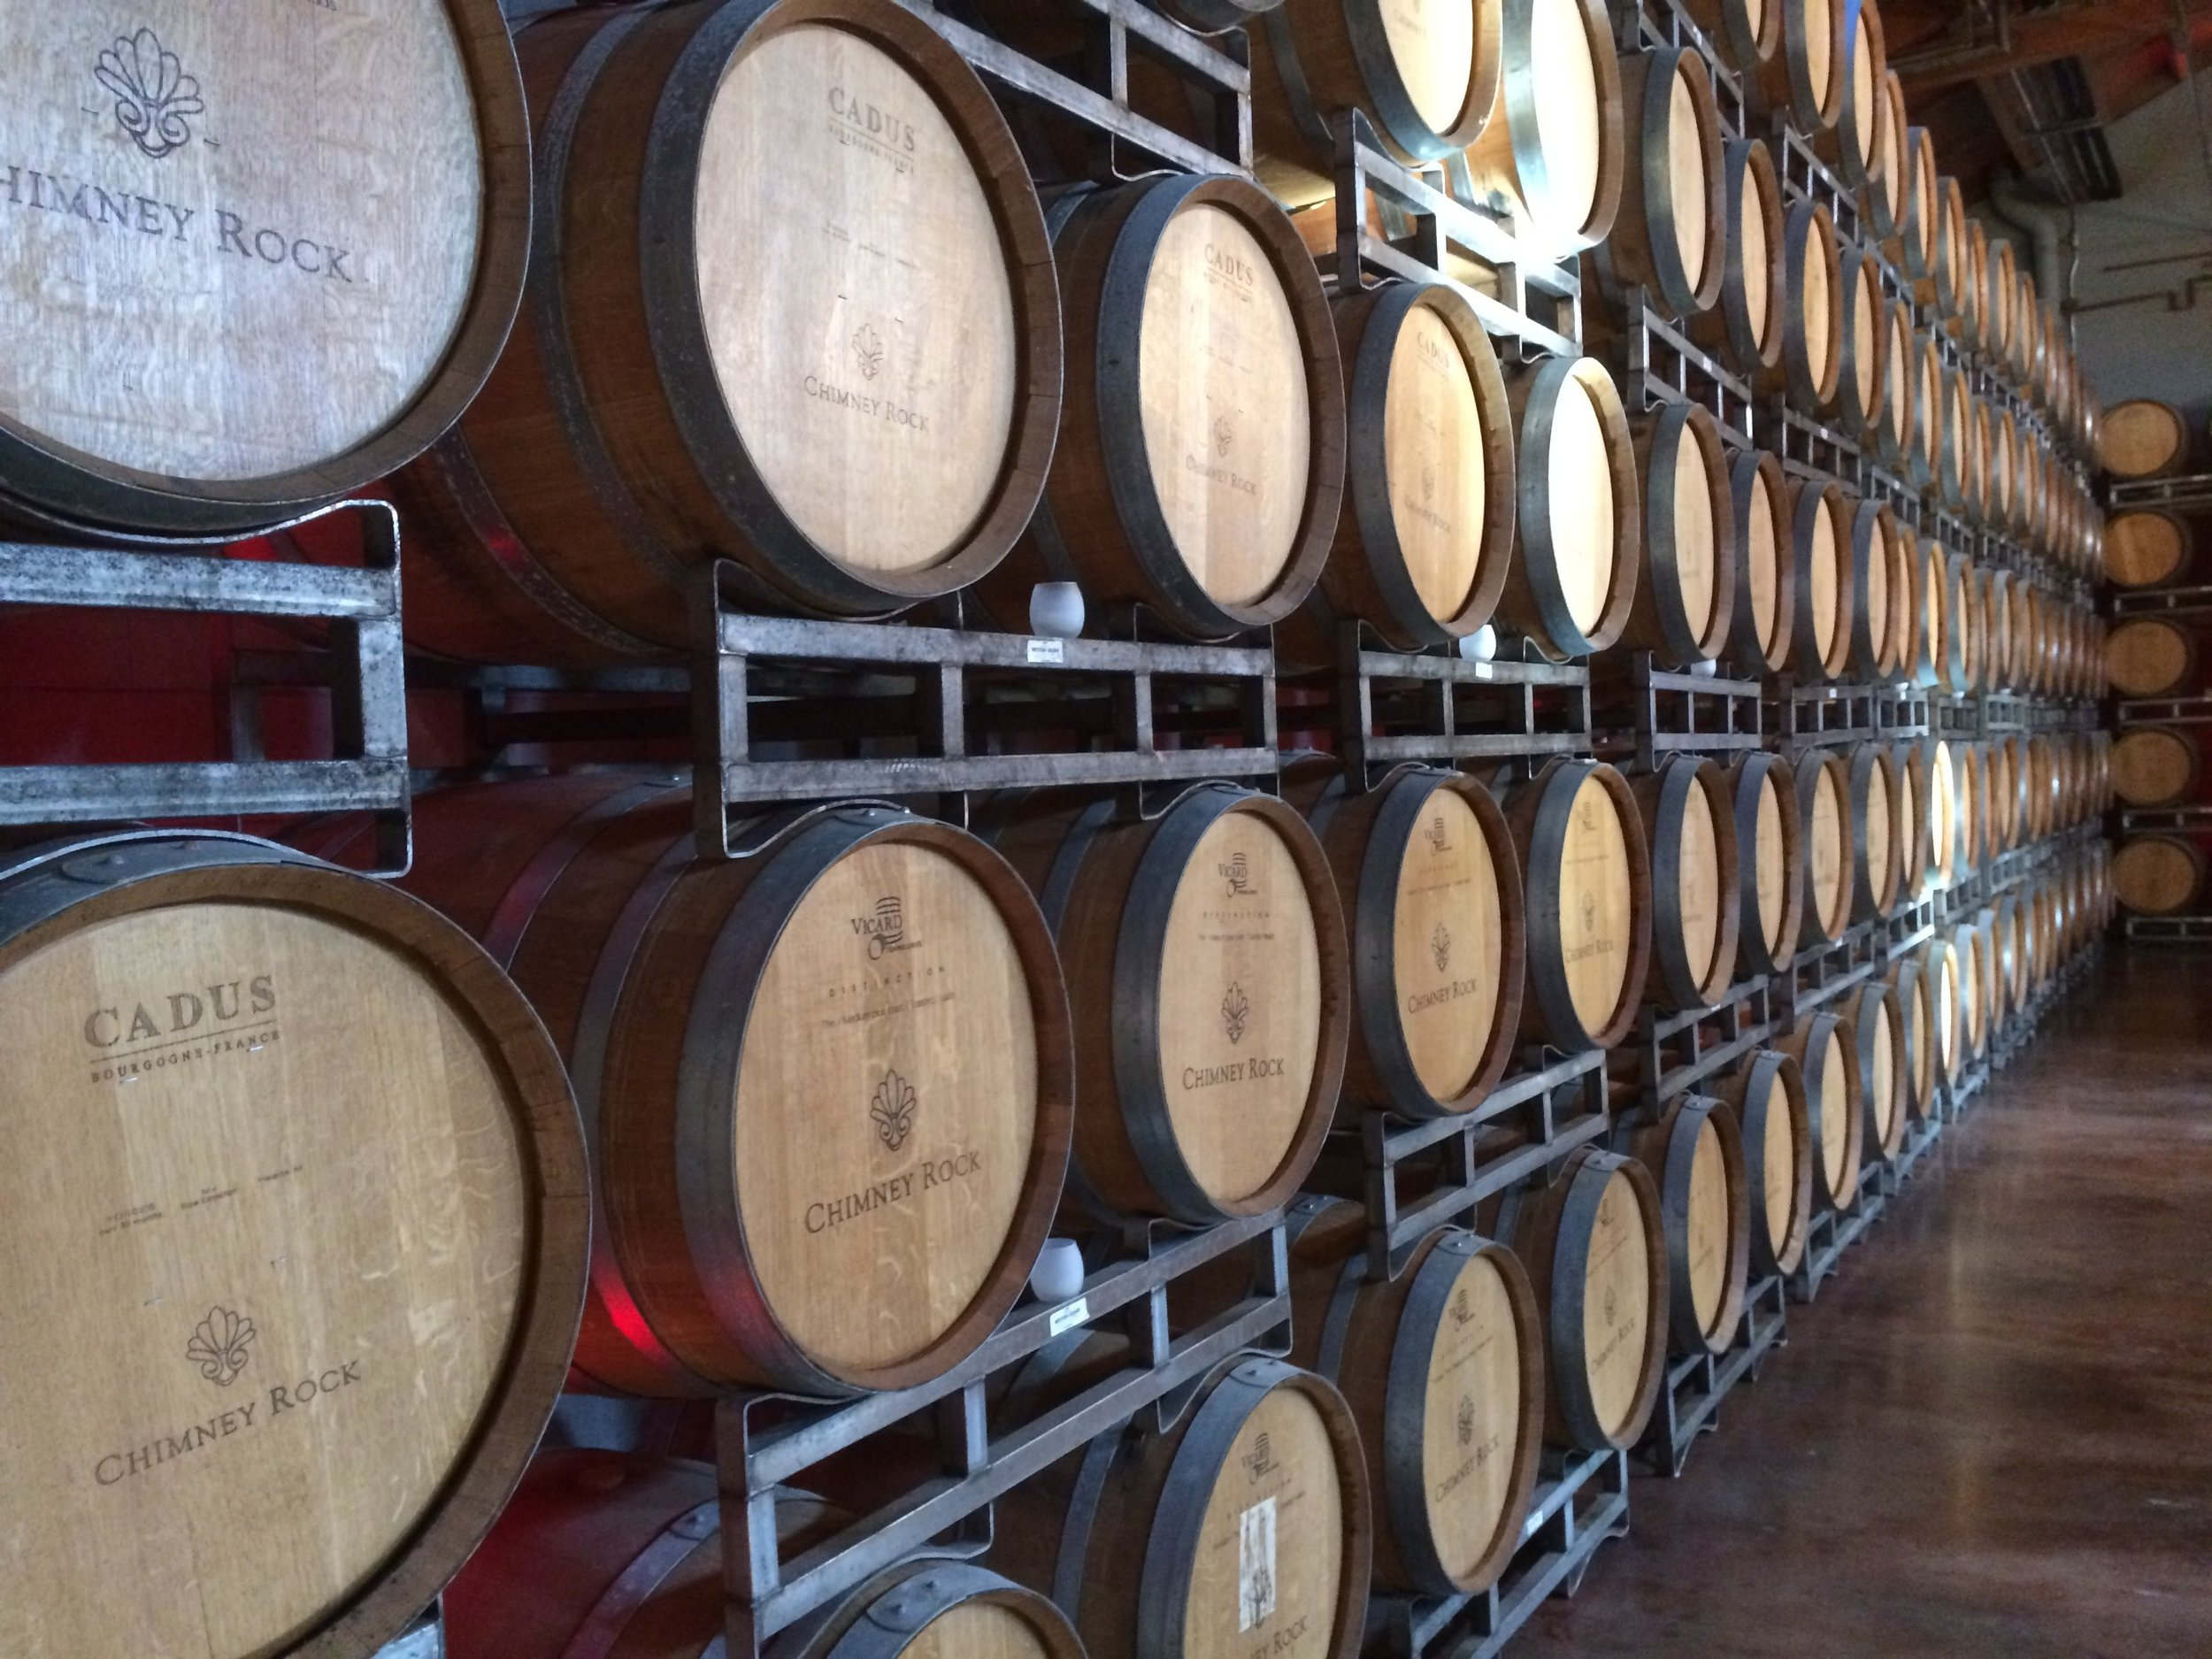 alcohol-barrel-basement-434311.jpg